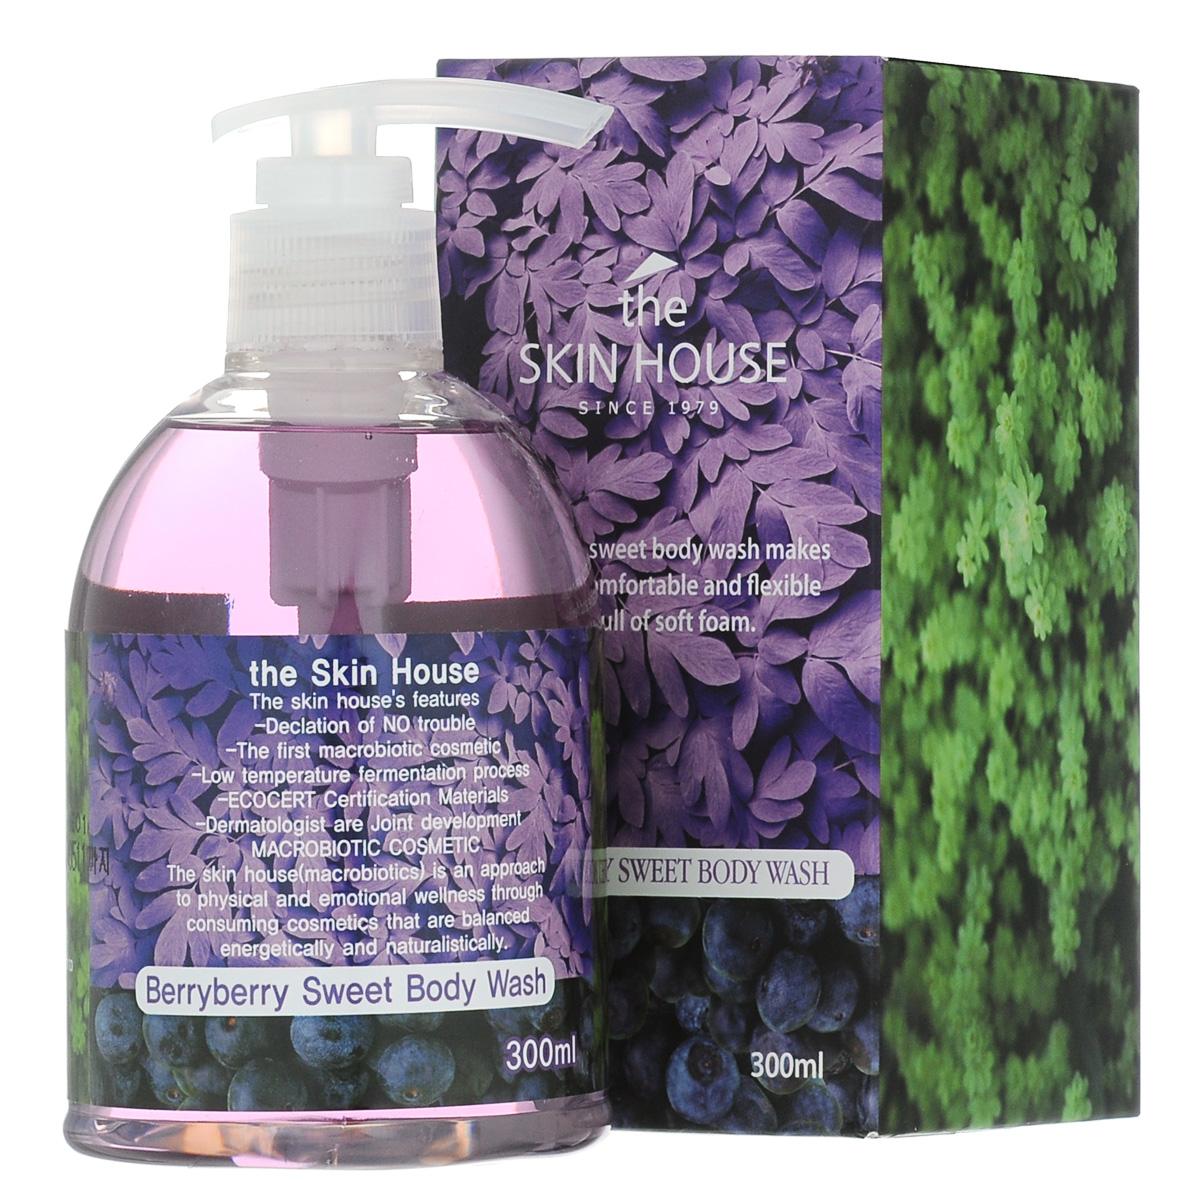 The Skin House Гель для душа с экстрактом ягод, 300 мл fa гель для душа oriental moments 250 мл